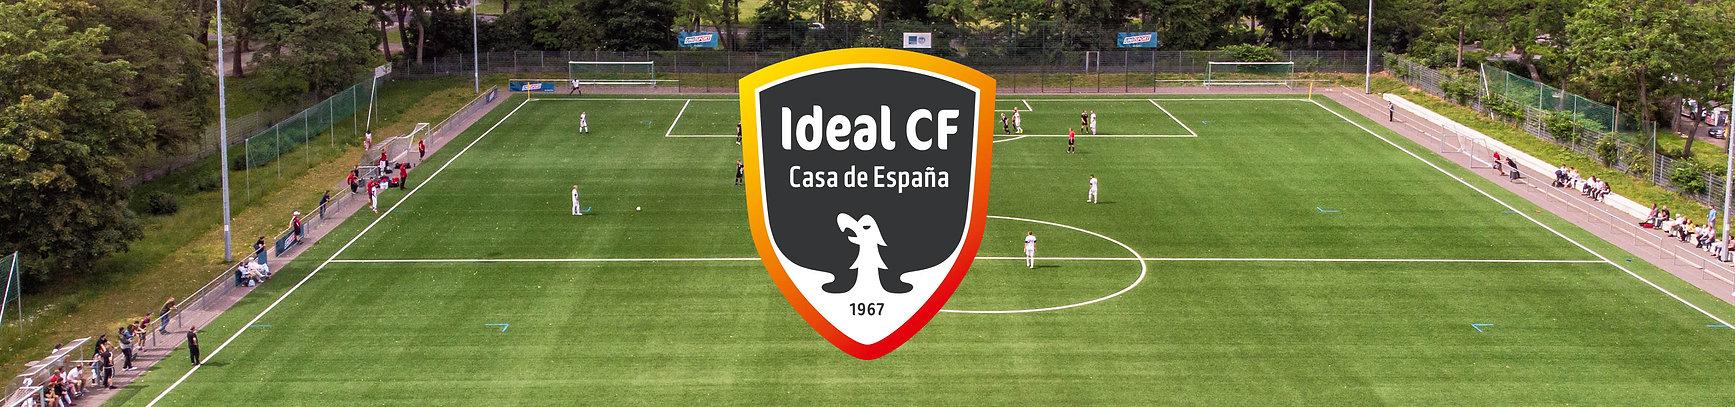 idealCF.jpg